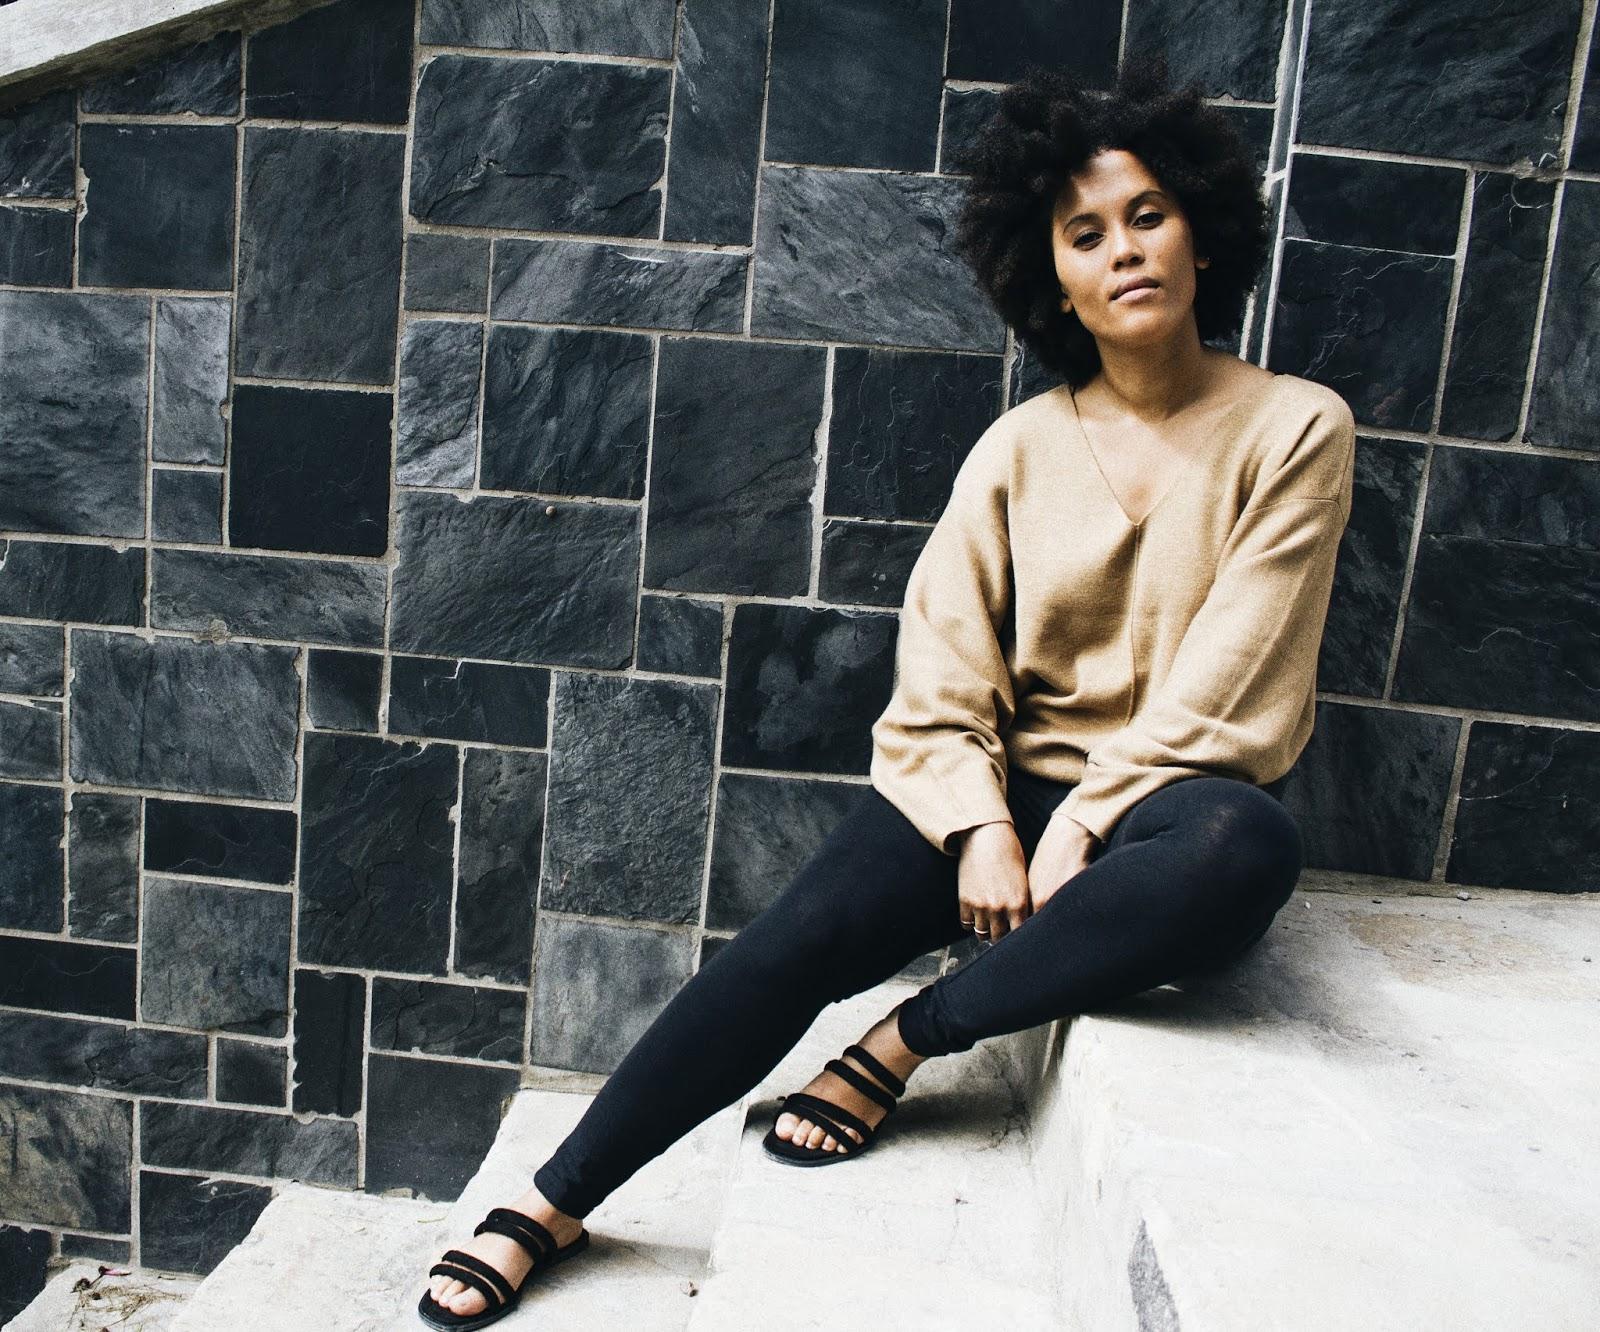 liezel-esquire-knit-sweater